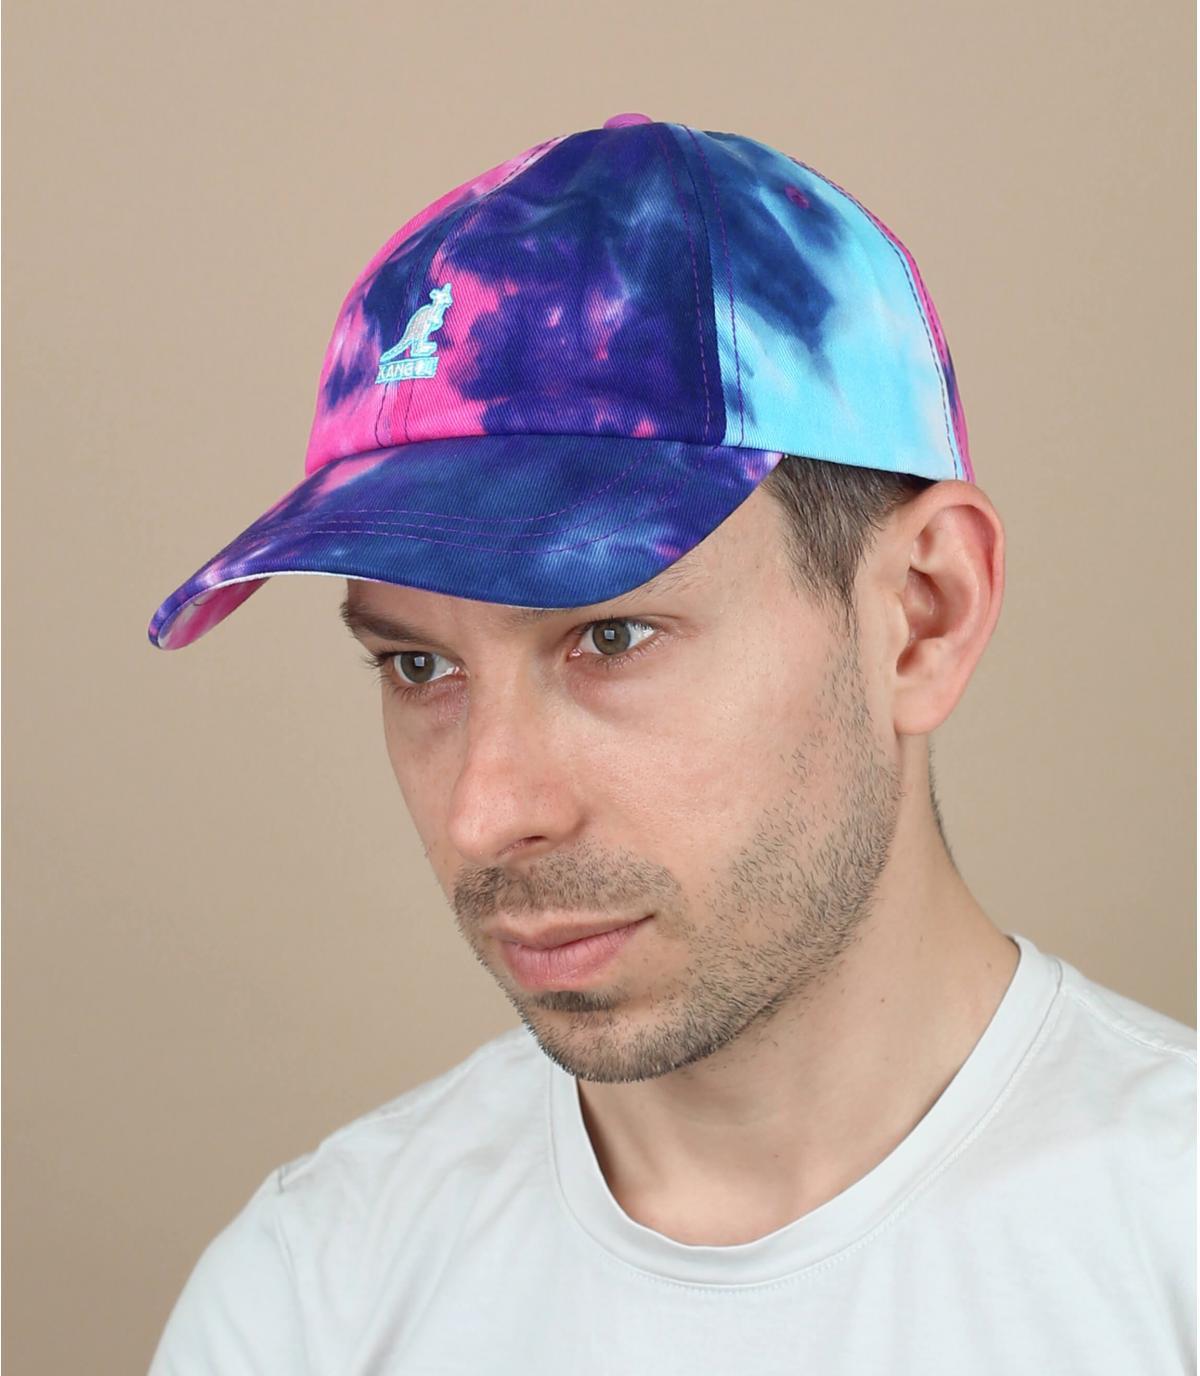 Gorra tie dye azul Kangol